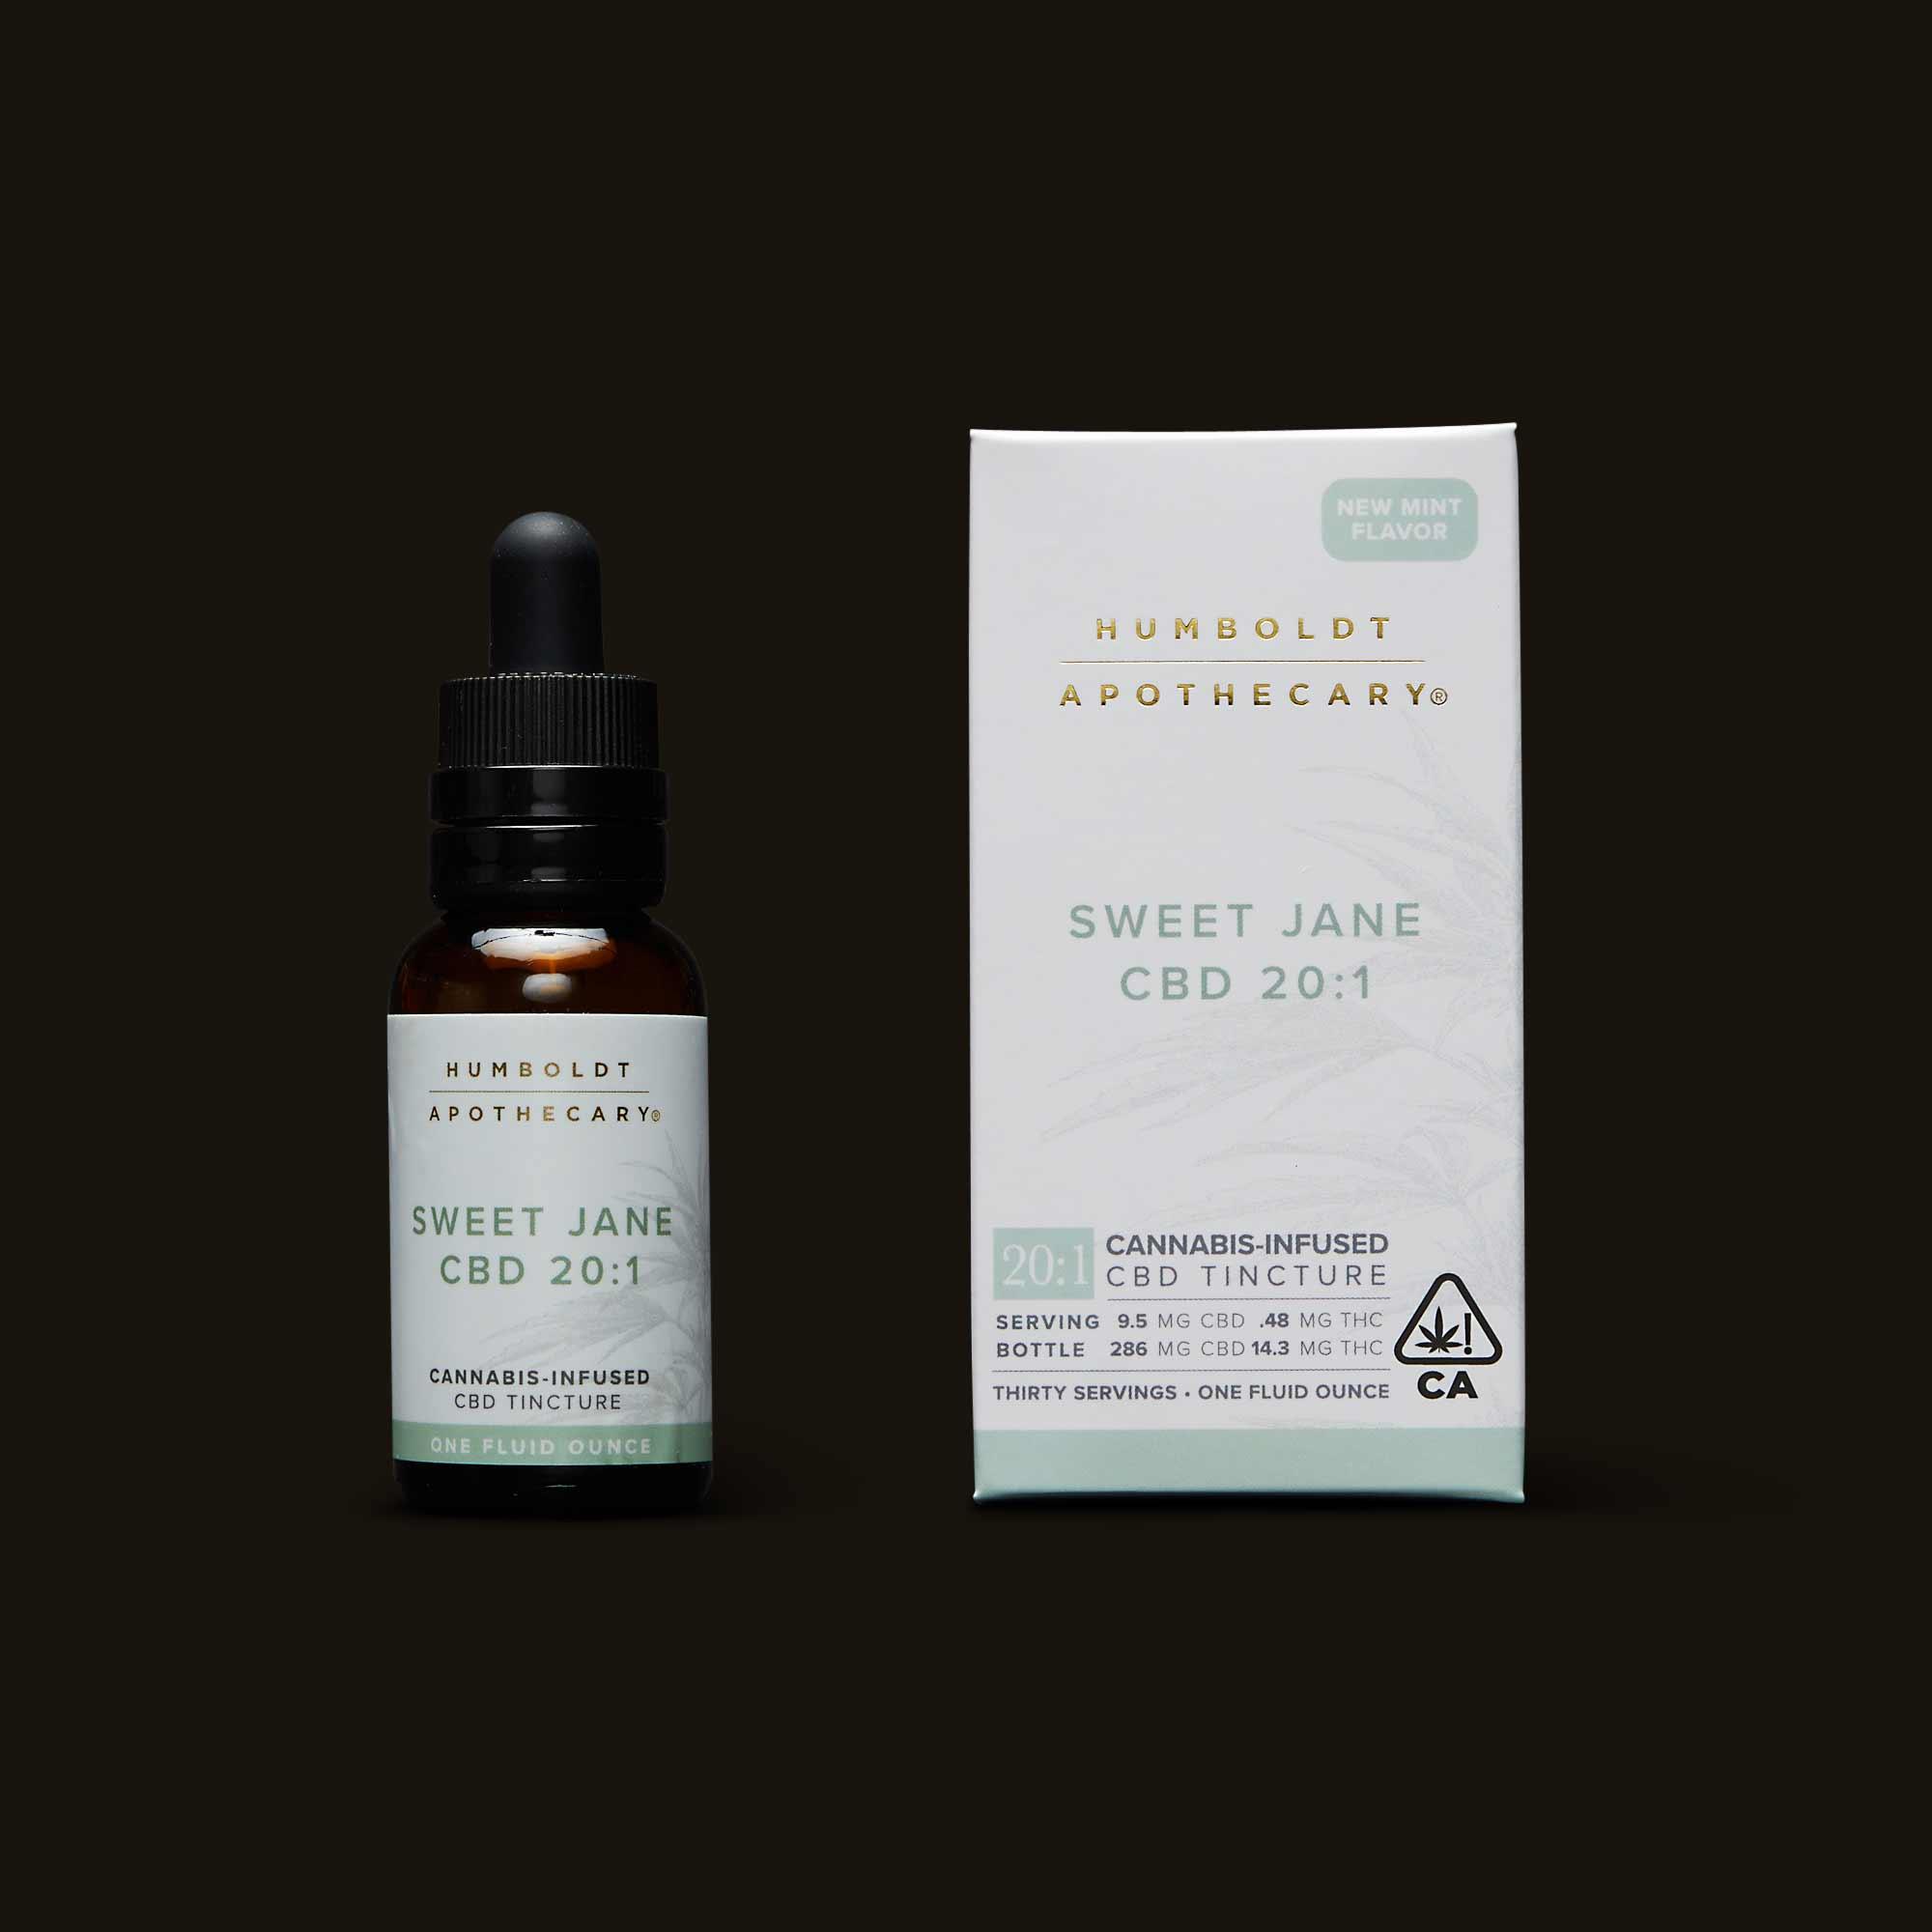 Sweet Jane CBD 20:1 - One 15ml bottle (11.9mg THC, 238.1mg CBD)